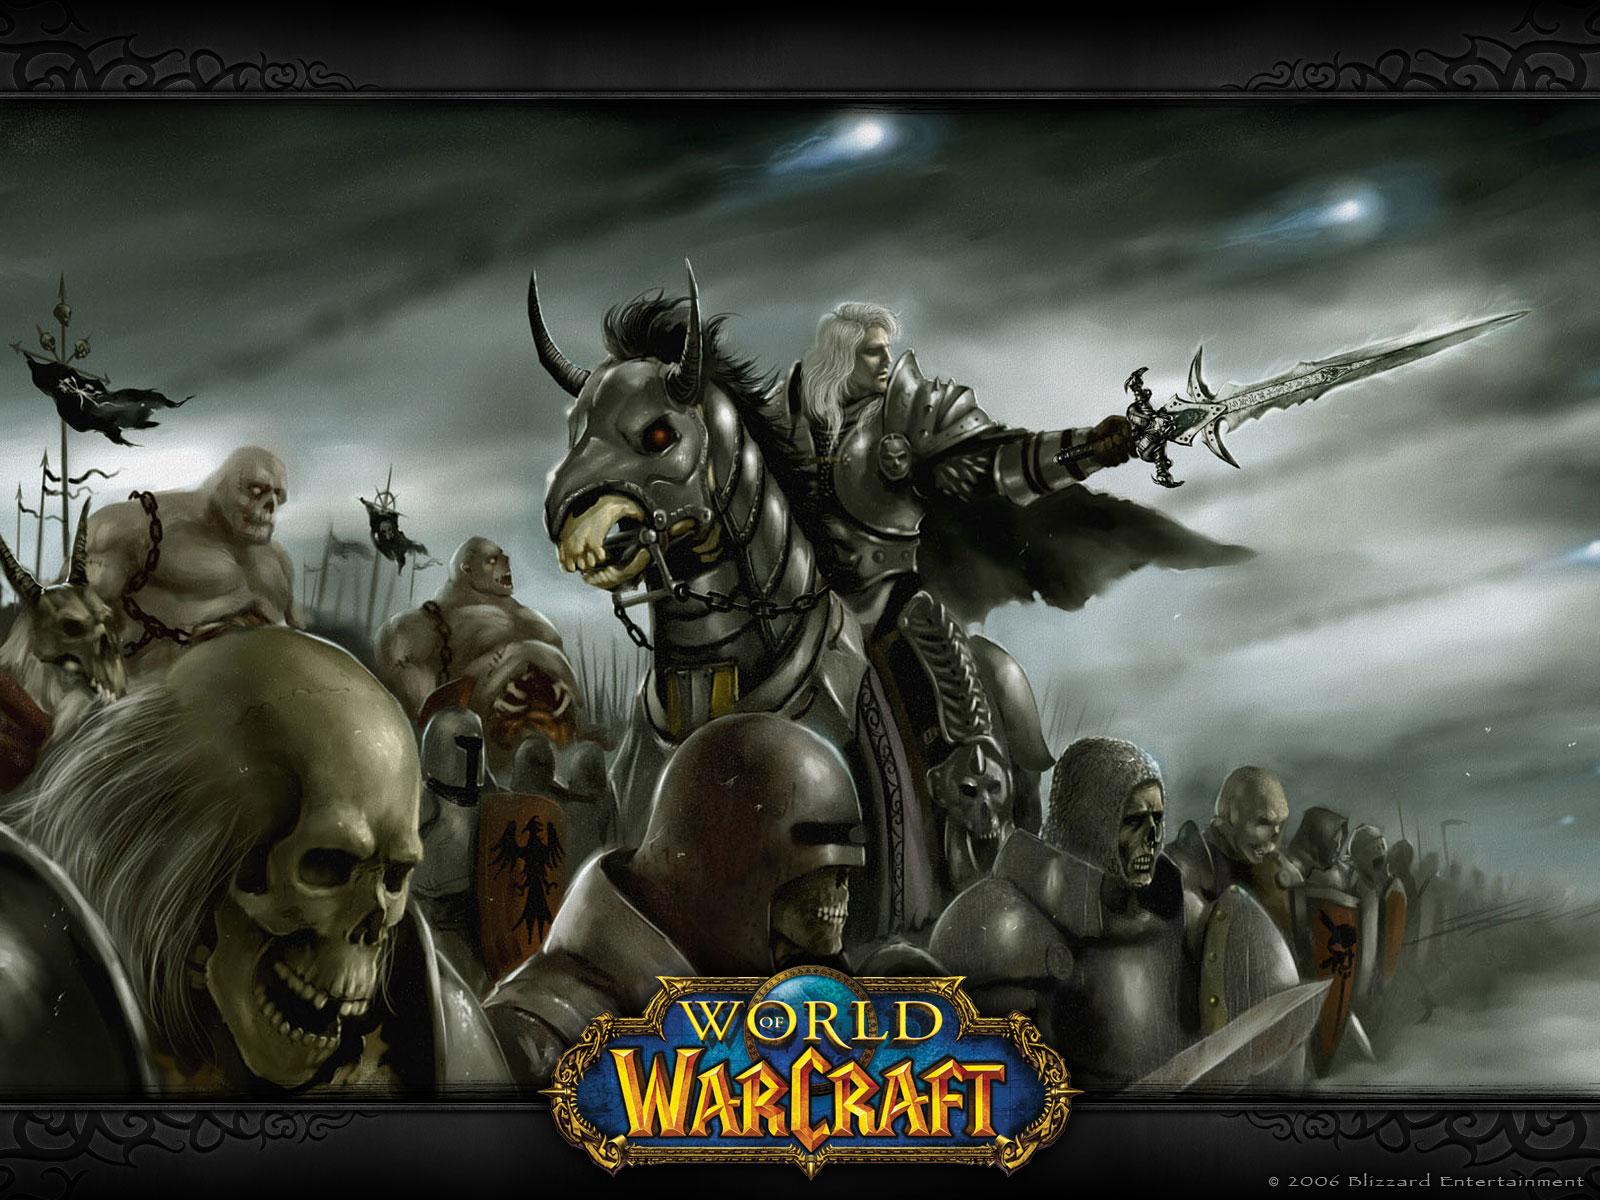 World of Warcraft wallpaper 21